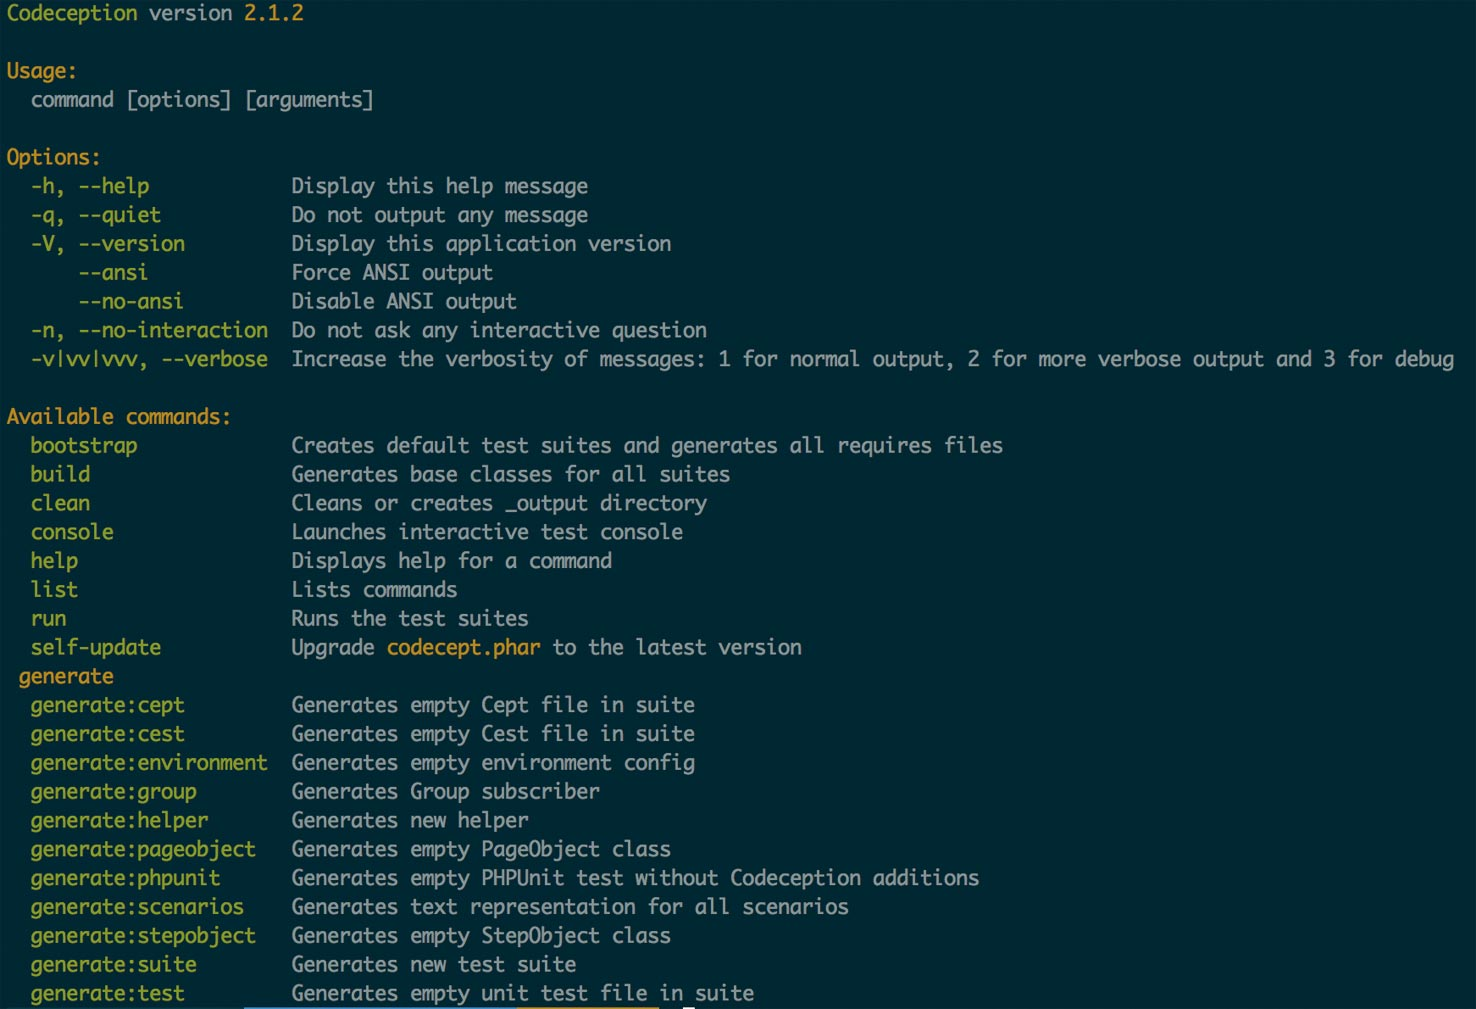 mautz_codeception_1.tif_fmt1.jpg